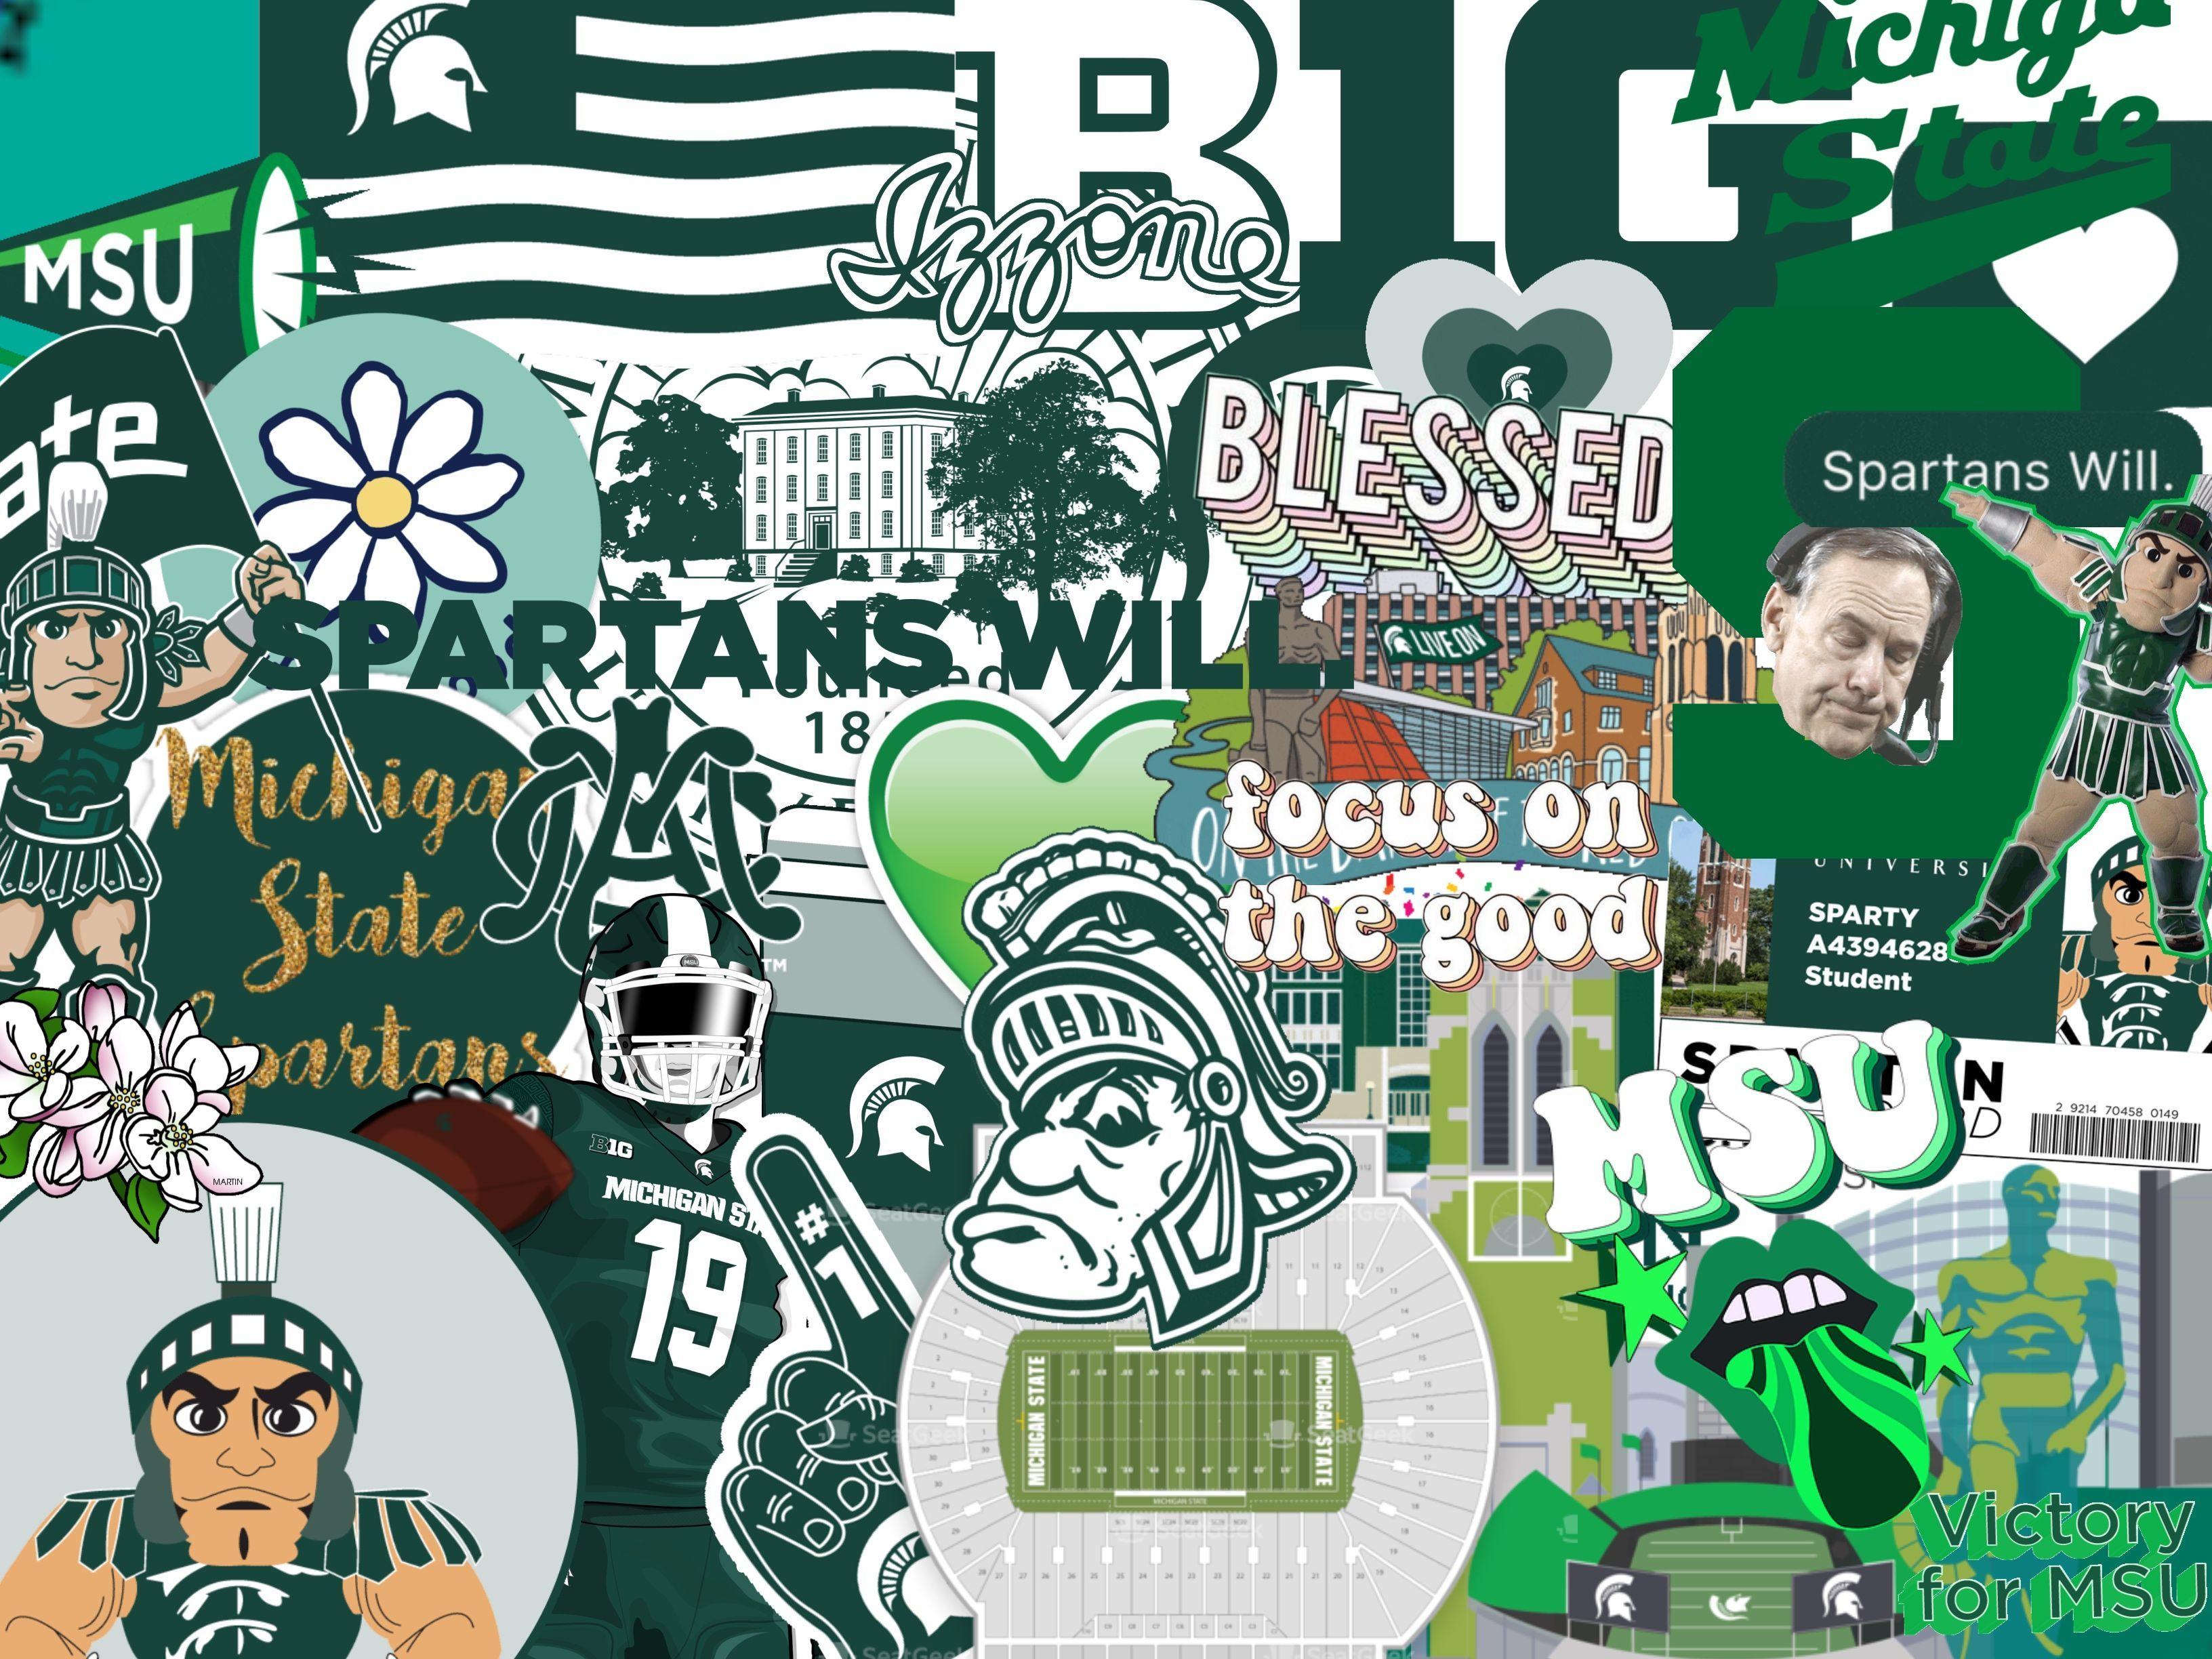 Michigan State University Aesthetic In 2021 Michigan State University Michigan State Collage Background [ 2448 x 3264 Pixel ]